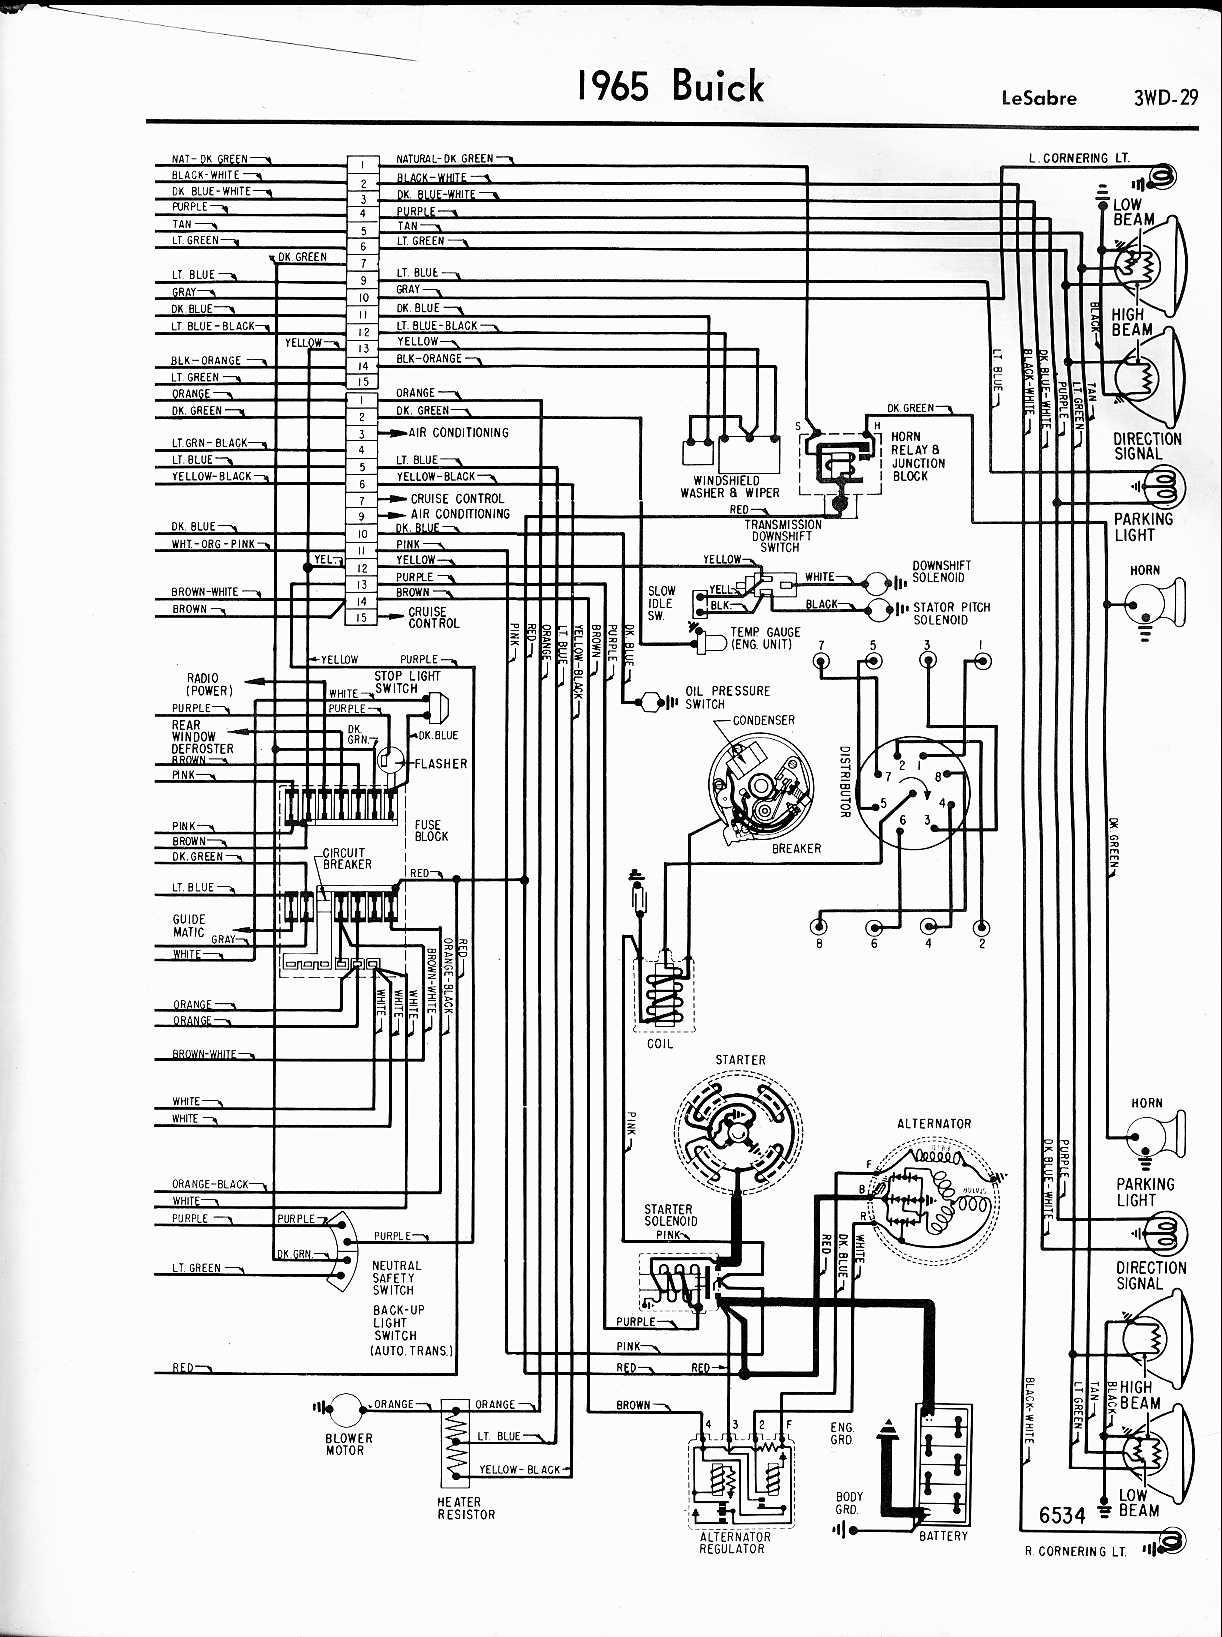 2000 Buick Lesabre Wiring Diagram